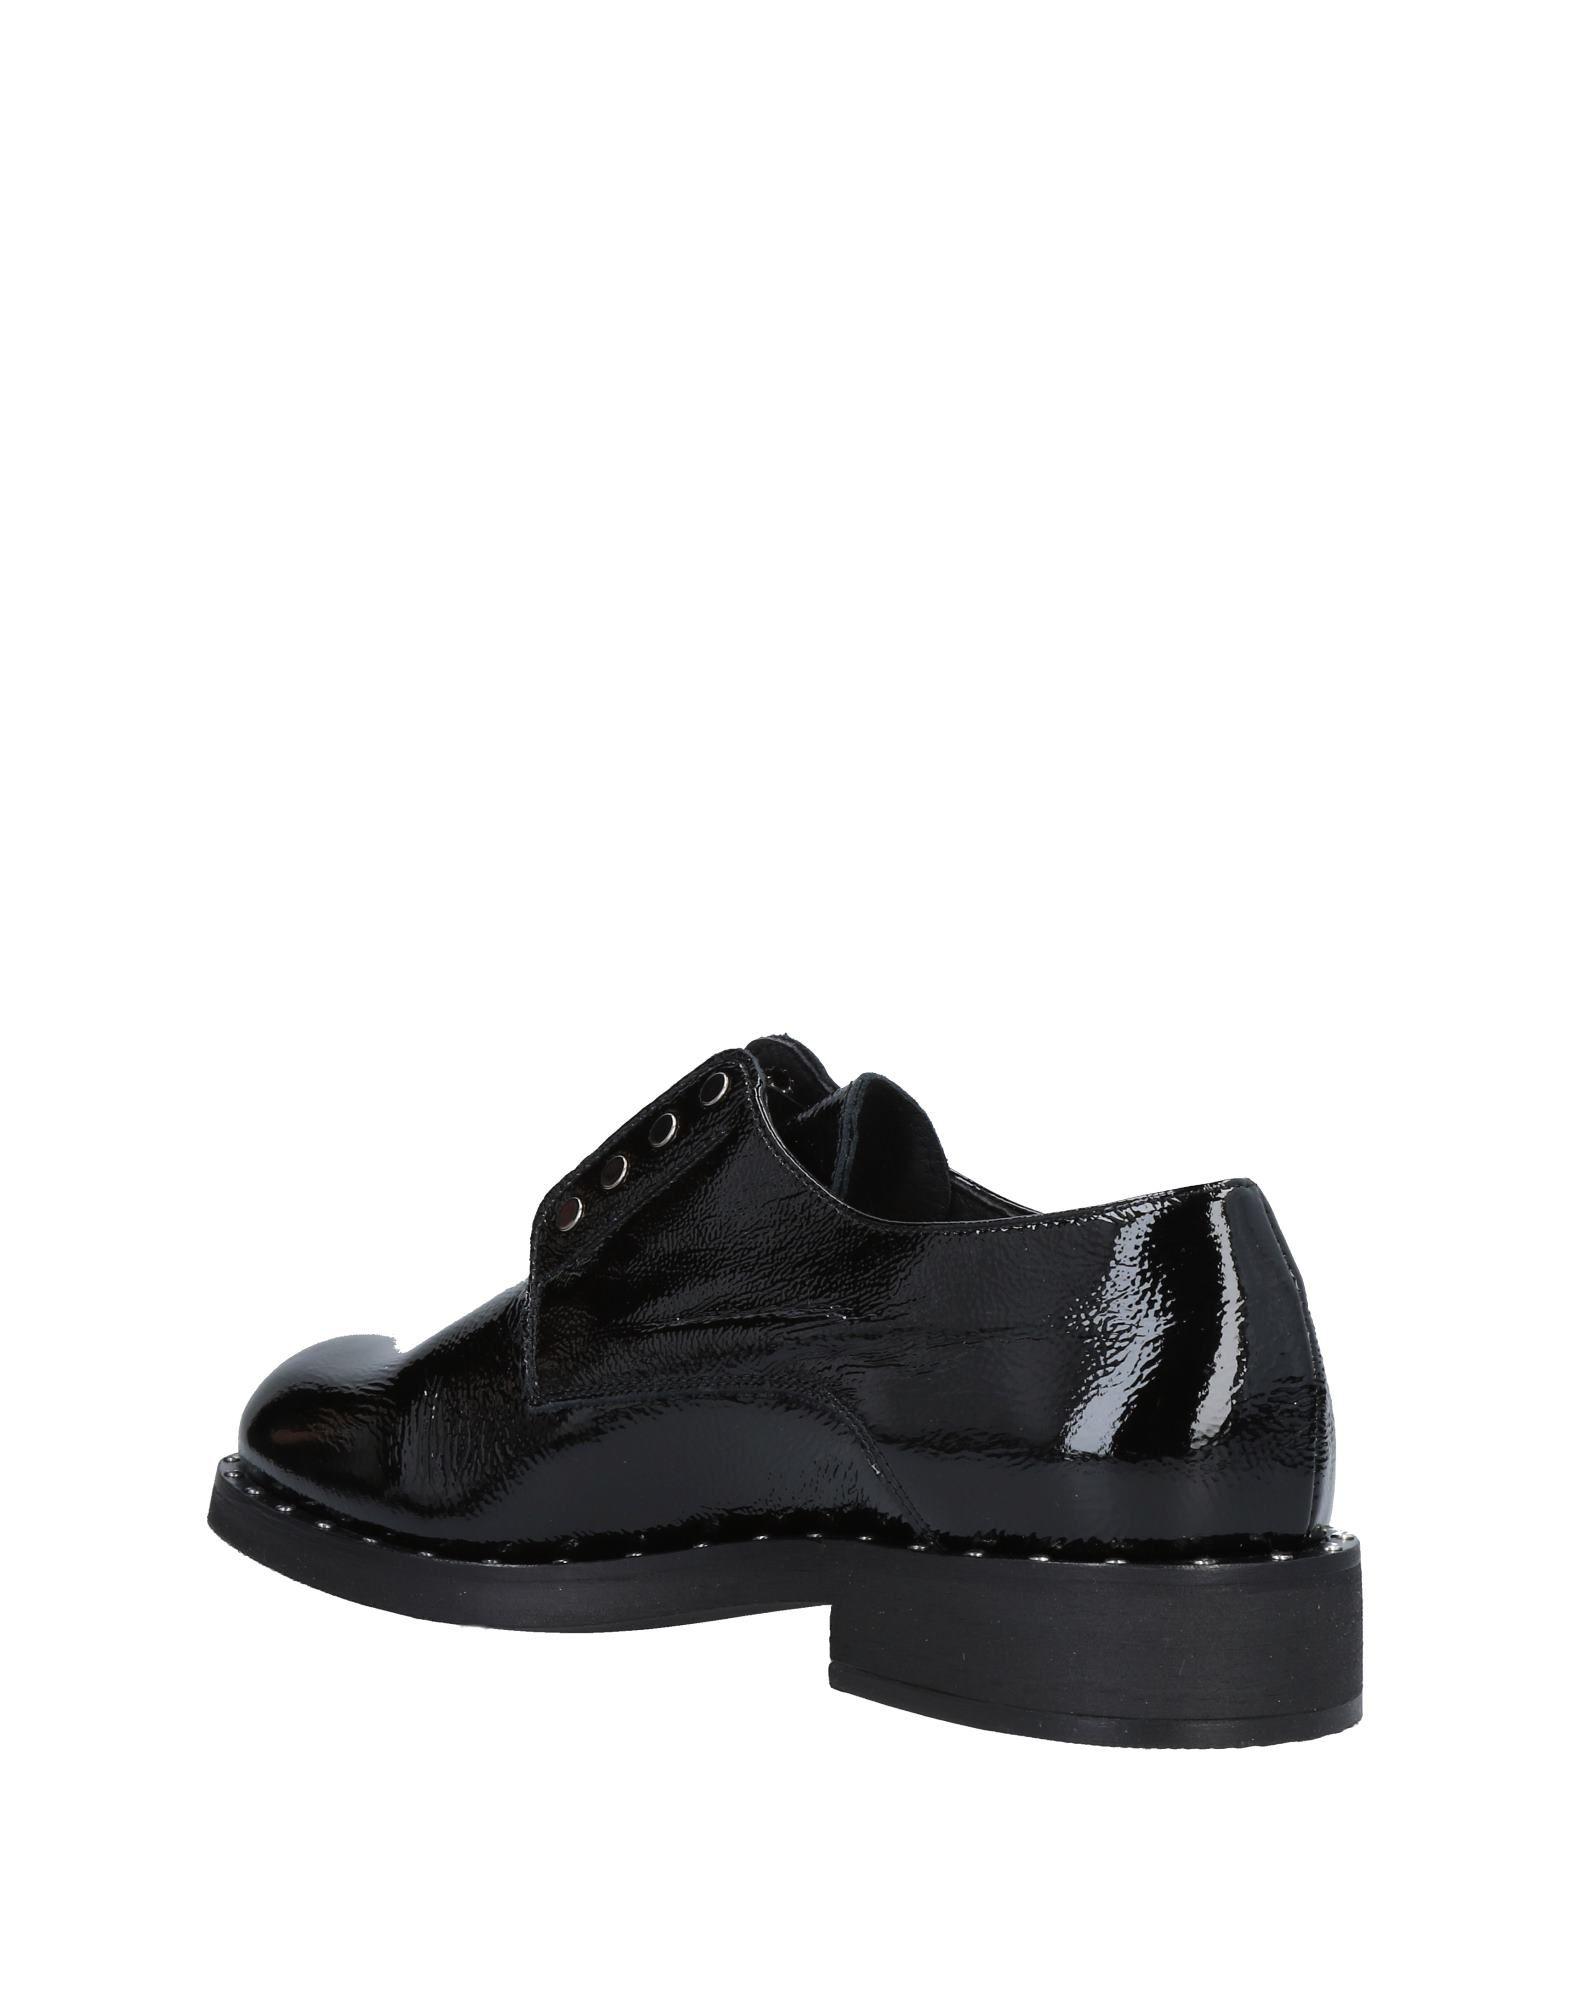 Nila & Nila Mokassins Damen Damen Damen  11476843TC Gute Qualität beliebte Schuhe b1c365